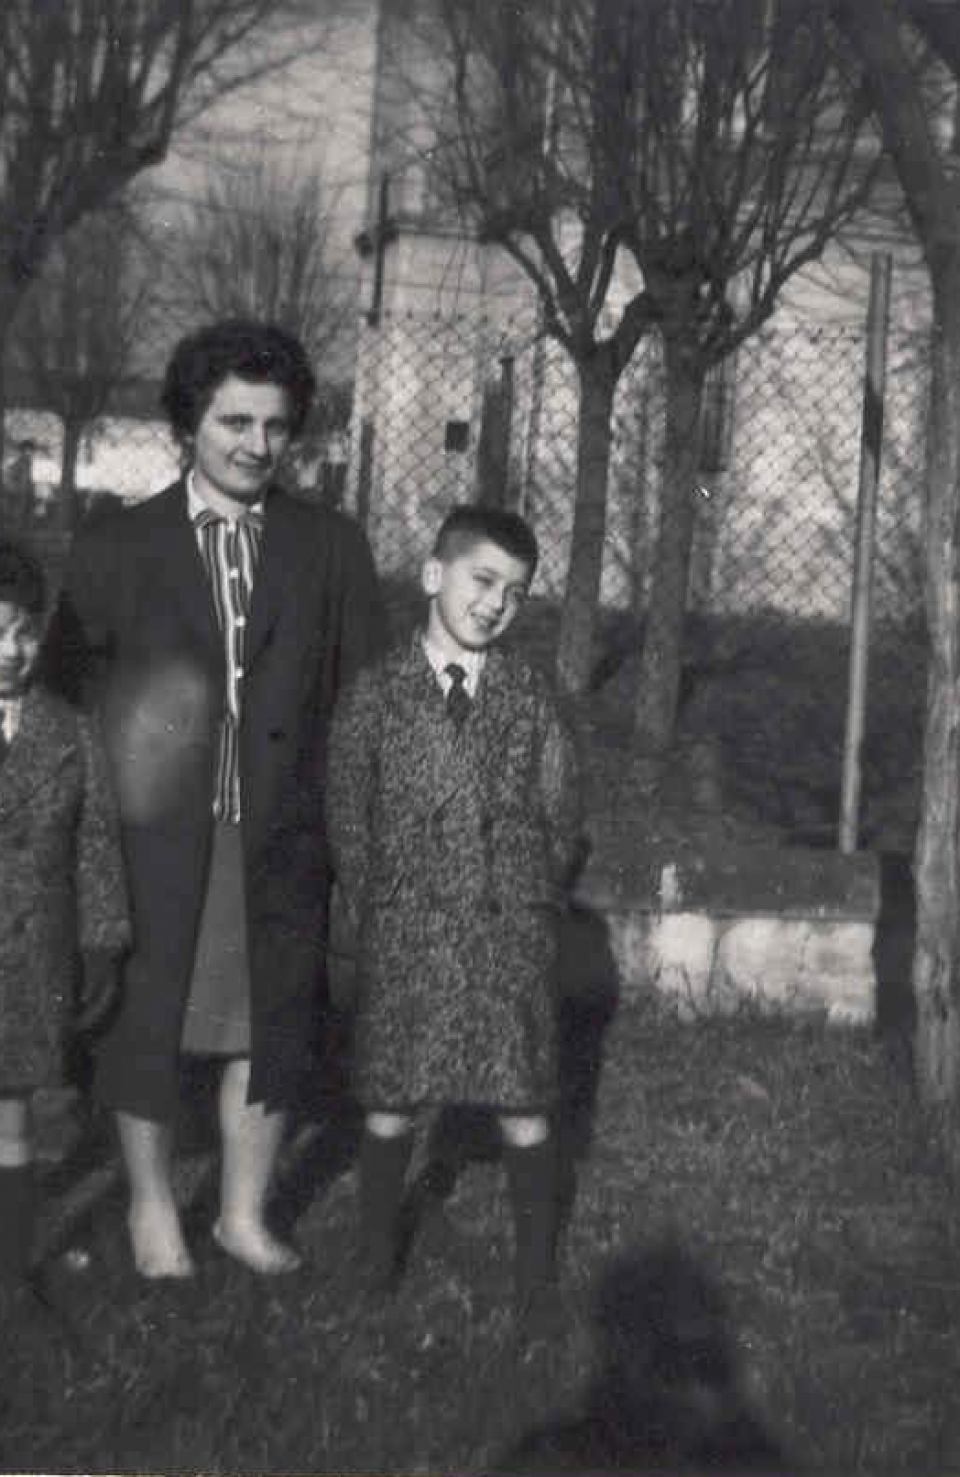 La famiglia Pavignani, 1967